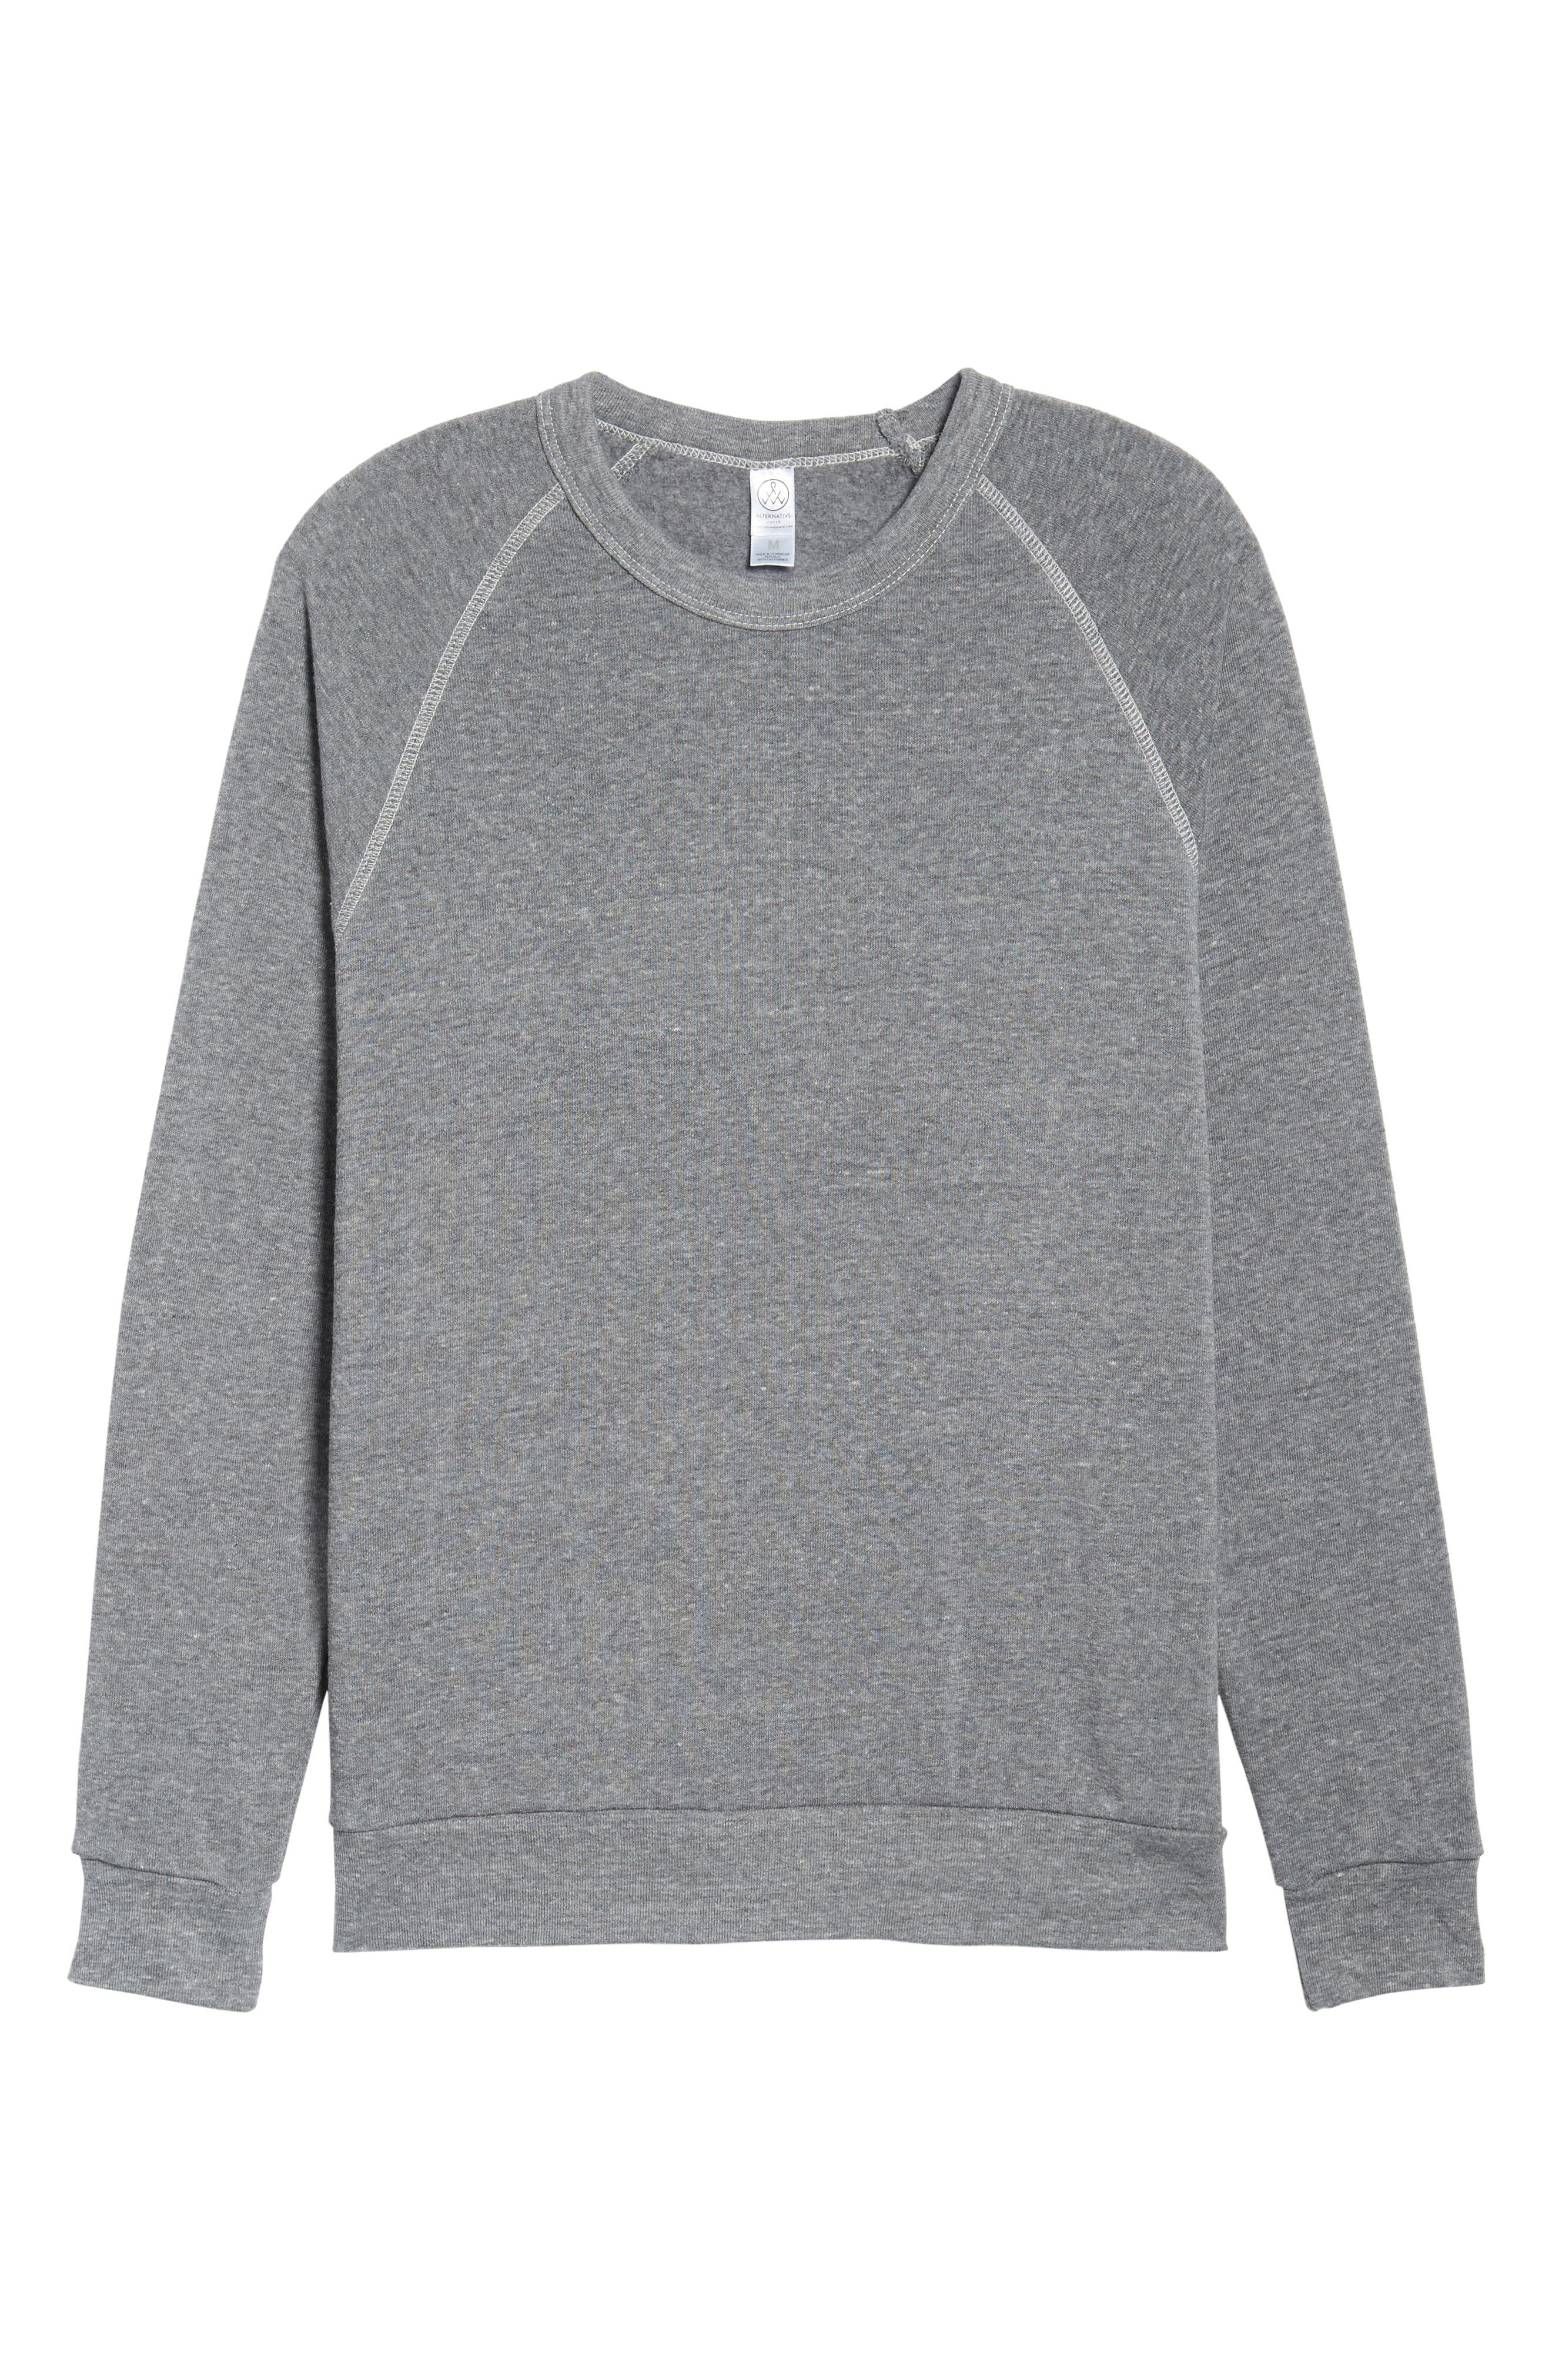 'The Champ' Sweatshirt,                             Alternate thumbnail 61, color,